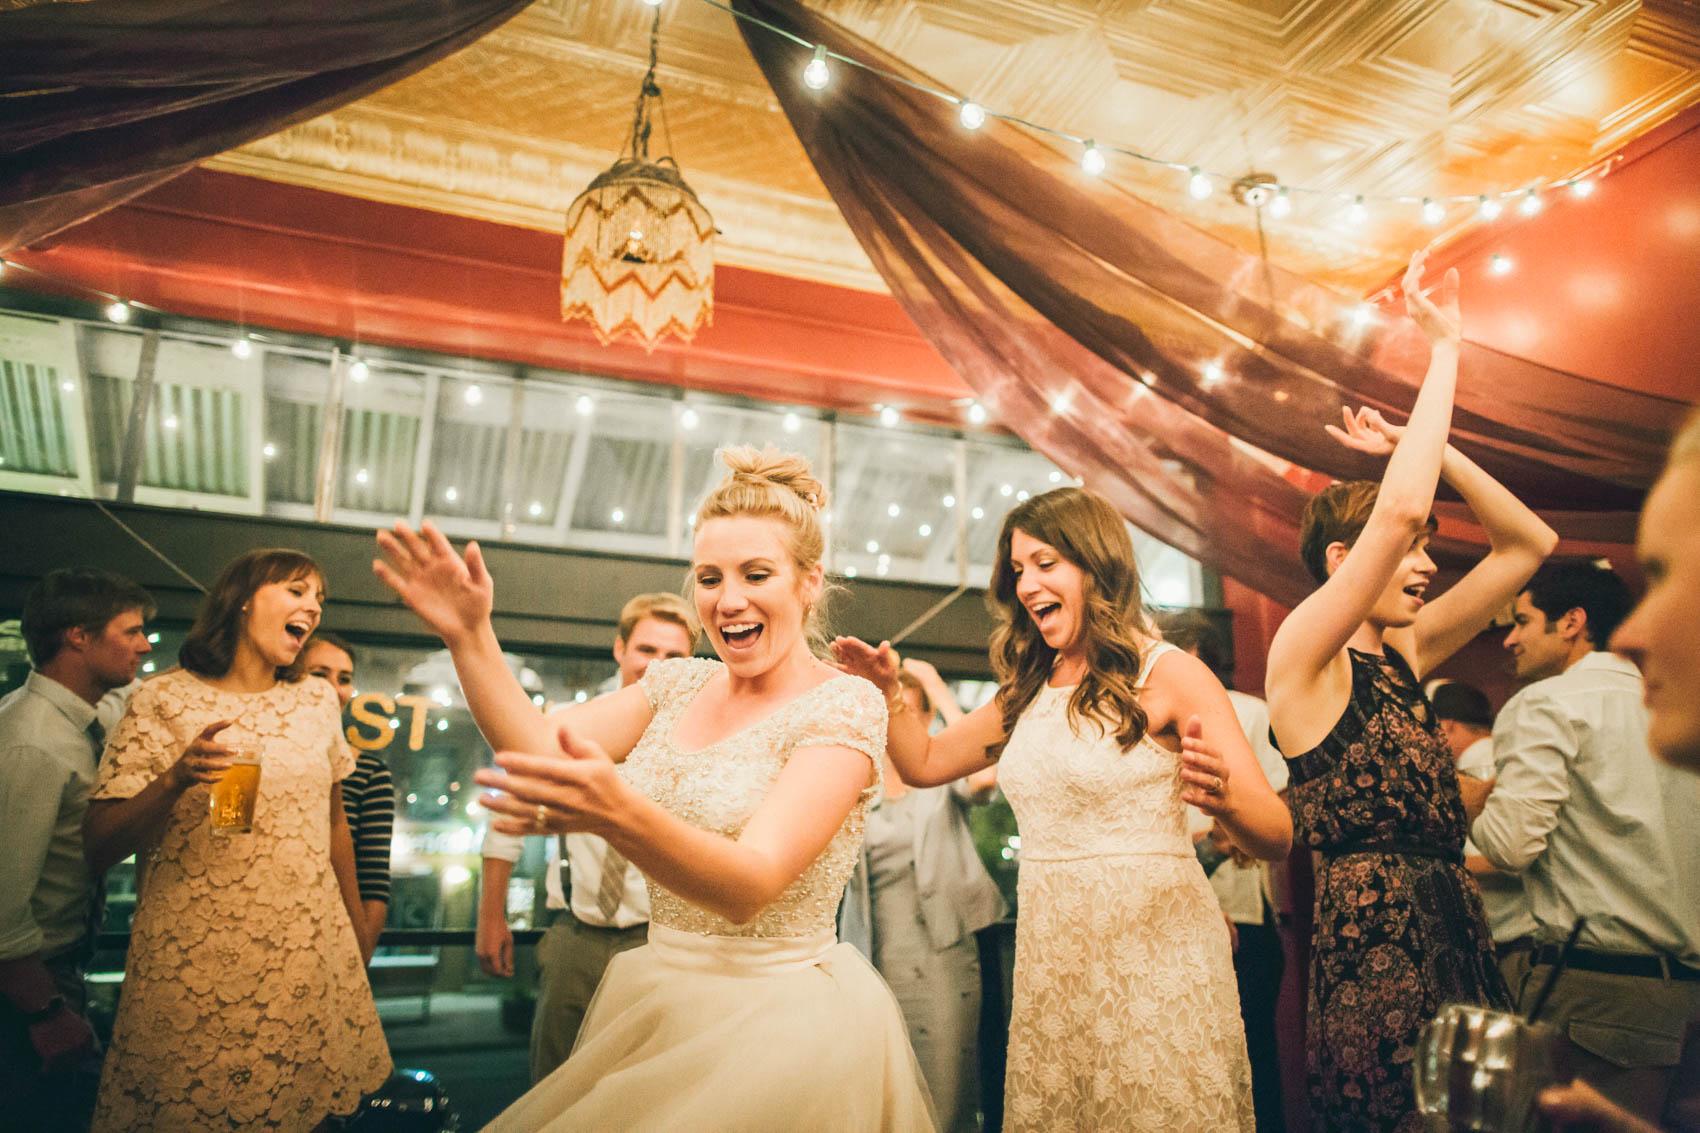 058_Crested Butte Wedding Photographer Secret Stash Woods Walk Ceremony Jamie Blue Bird Events Boho Epic Stars